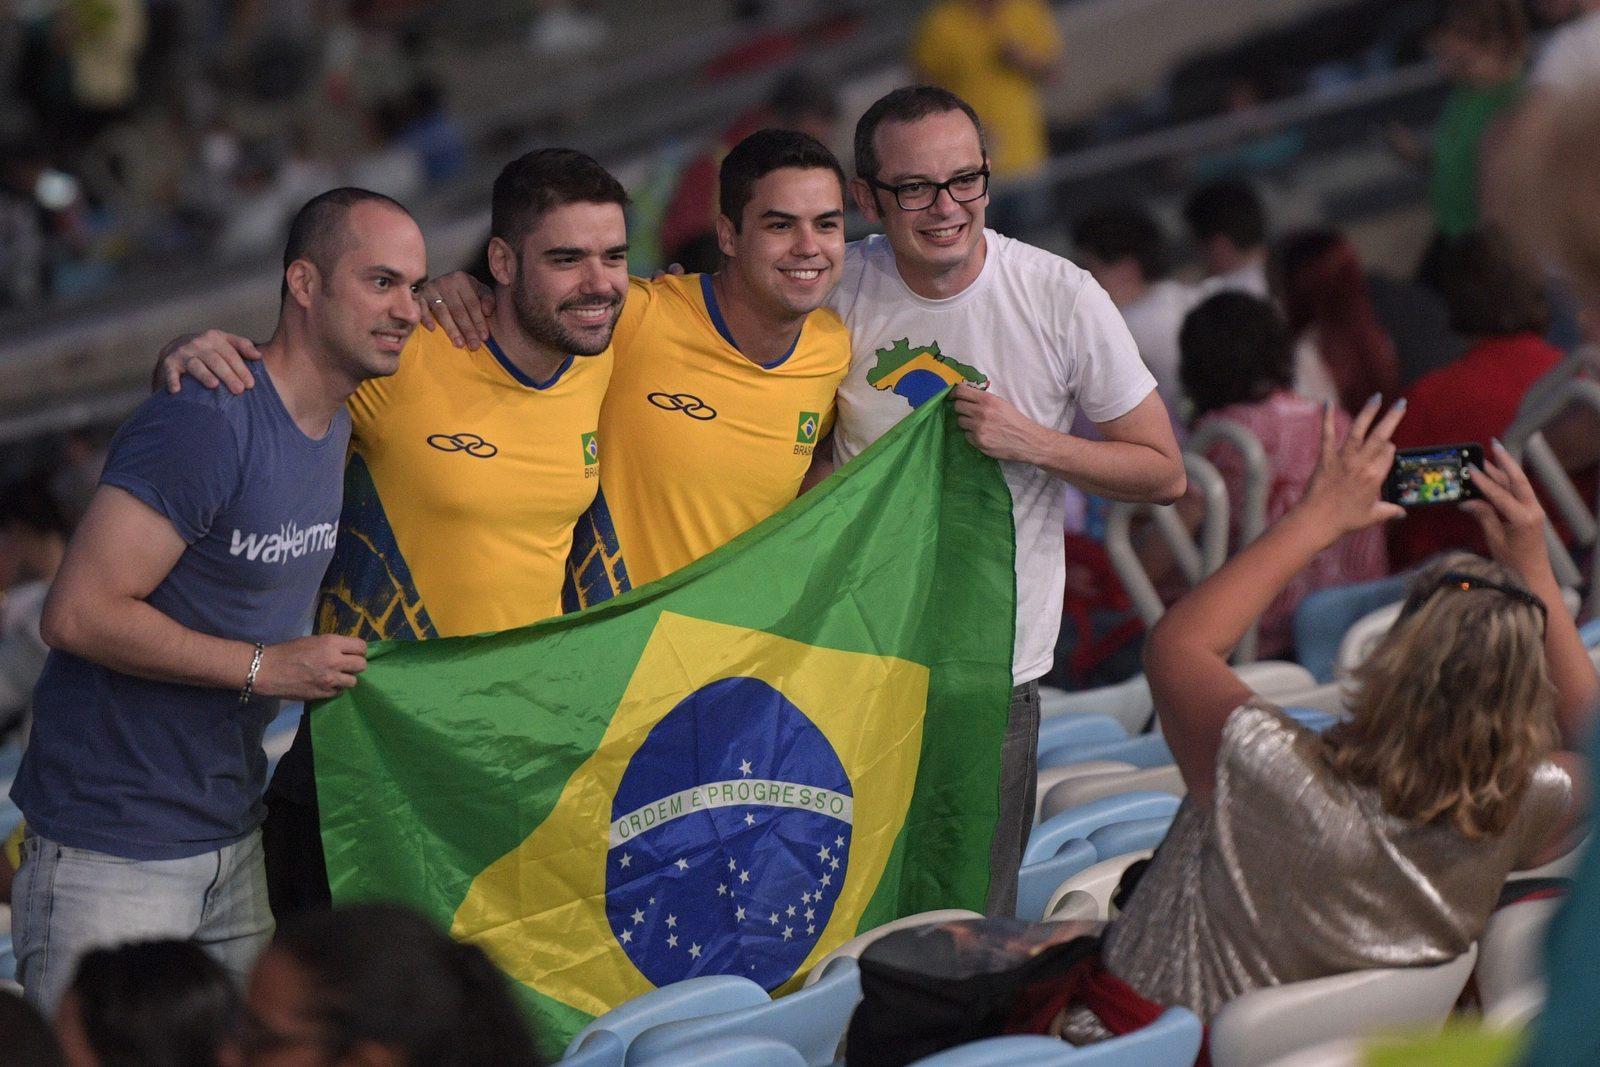 Olympia 2016 Im Live Ticker Die Spiele In Rio Sind Eroffnet Olympia 2016 Rio